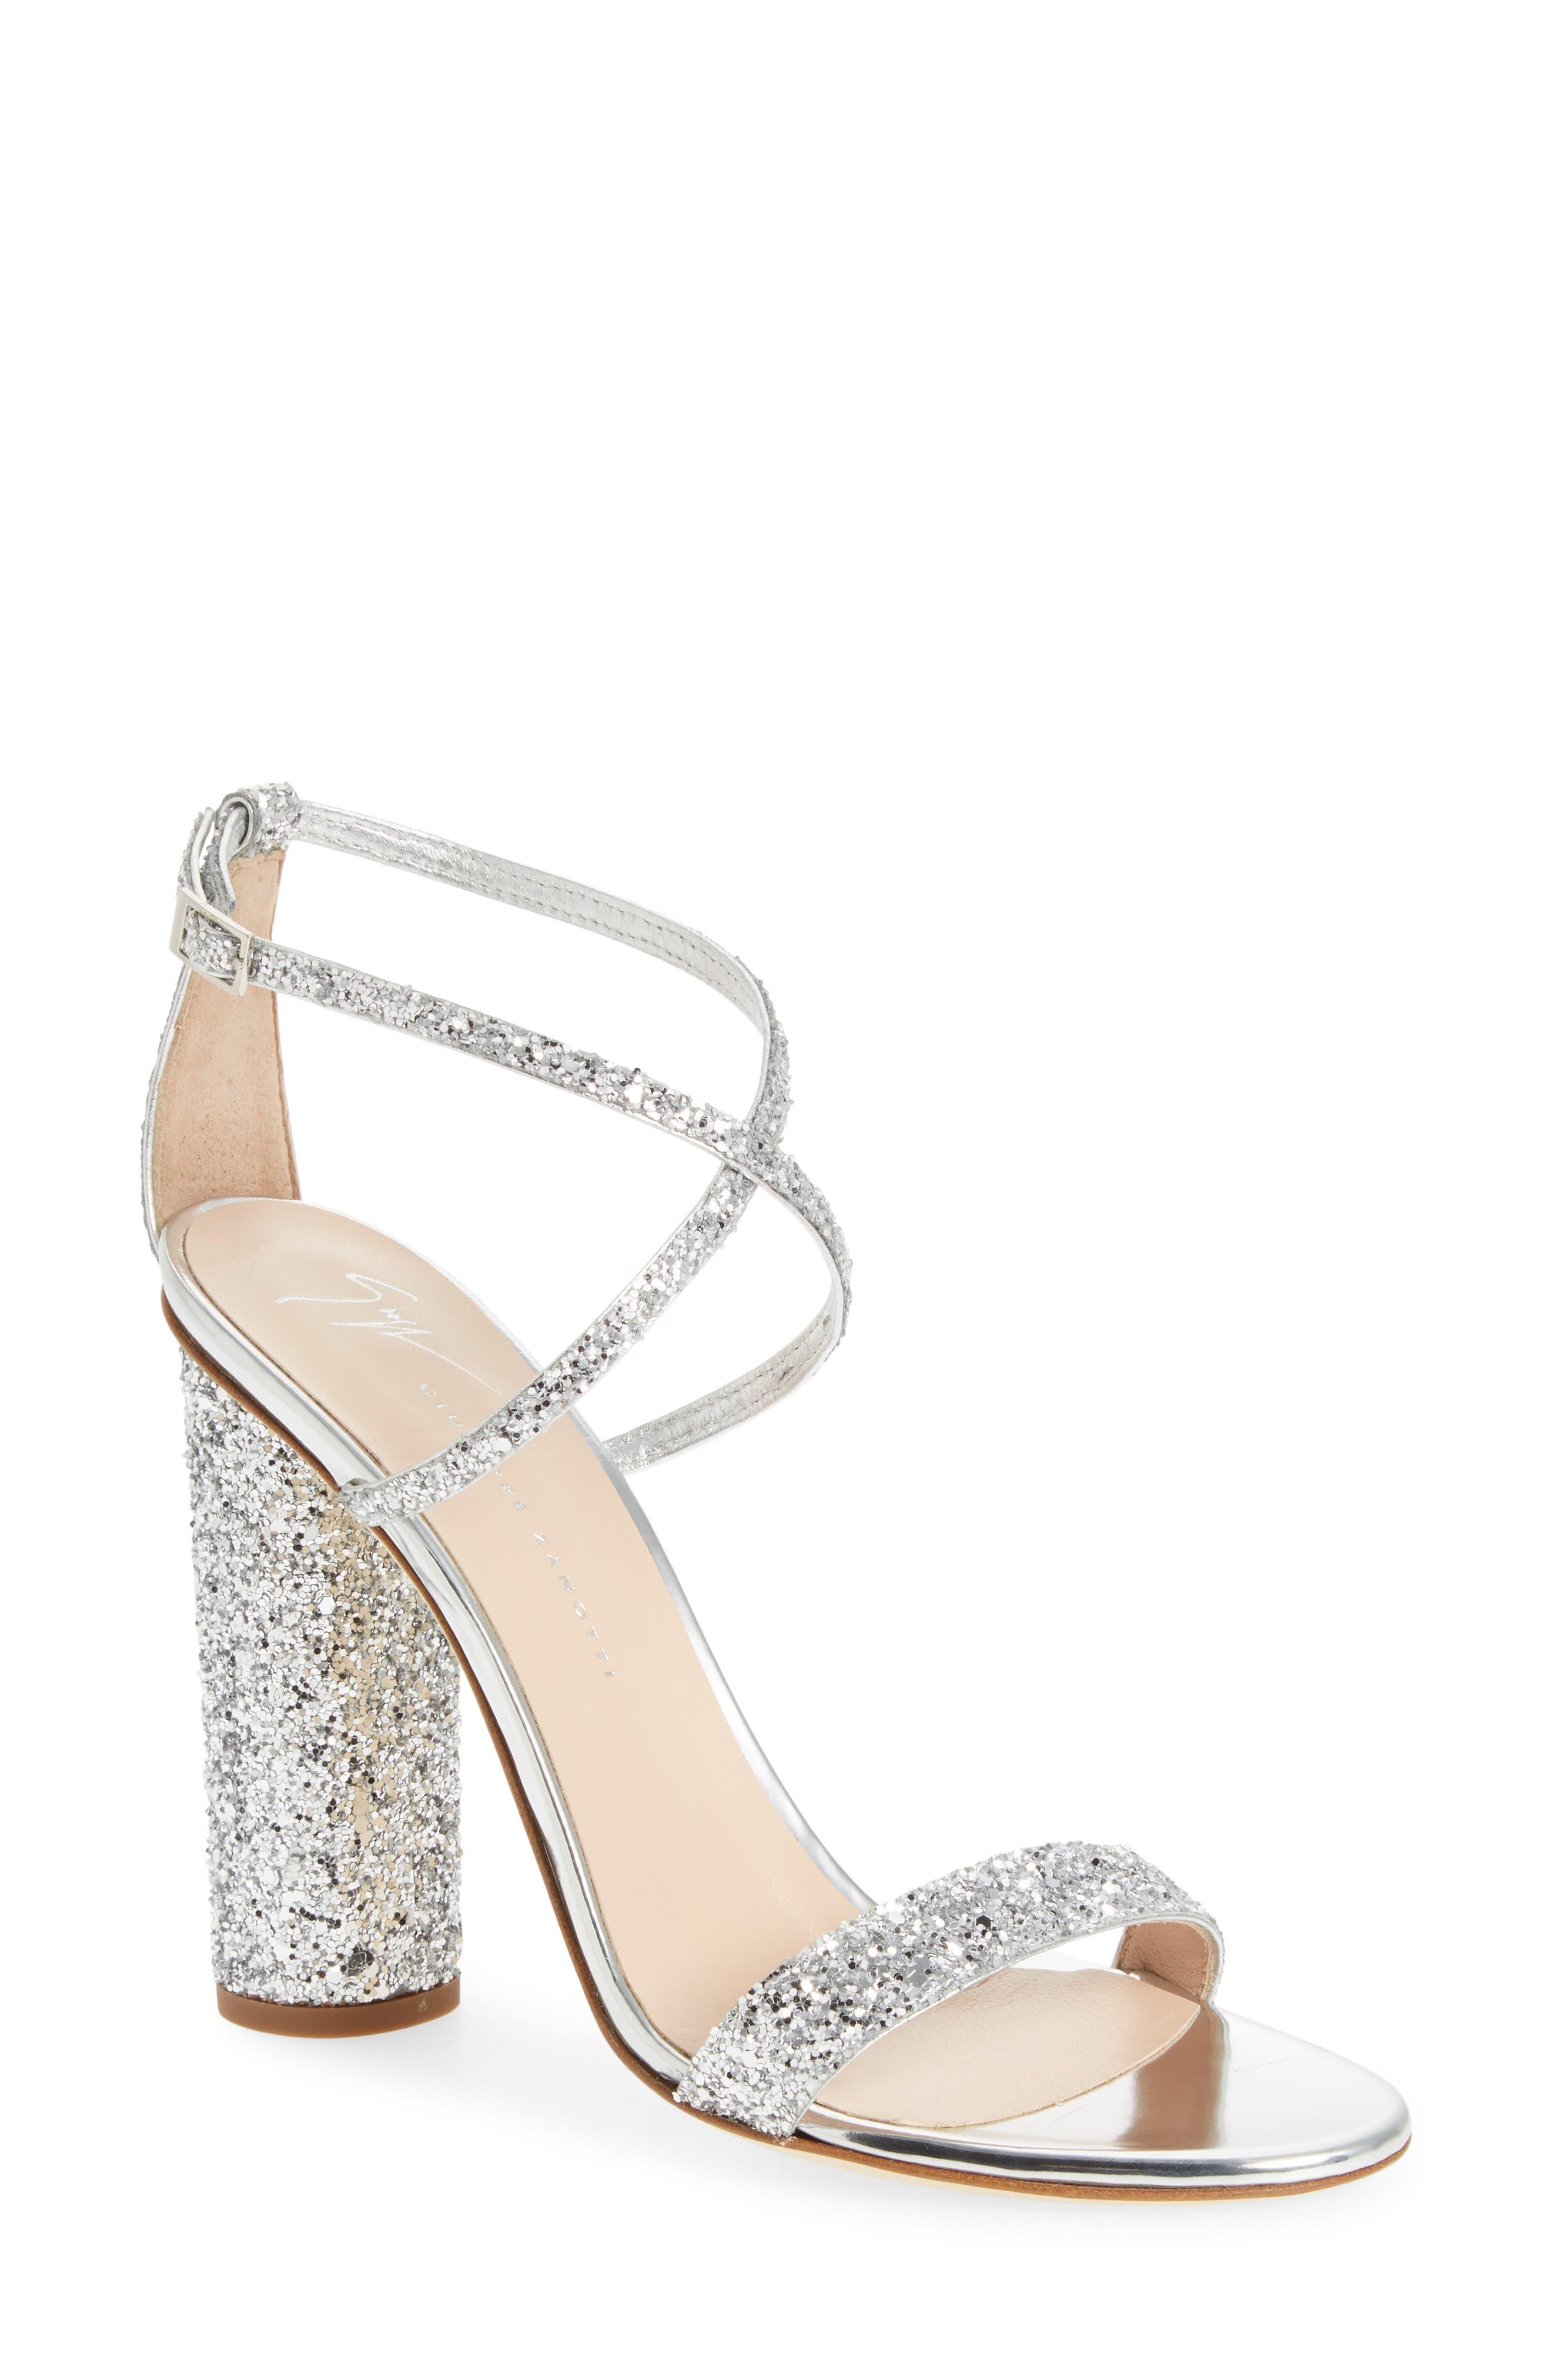 Giuseppe Zanotti Glitter Heel Sandal, Metallic